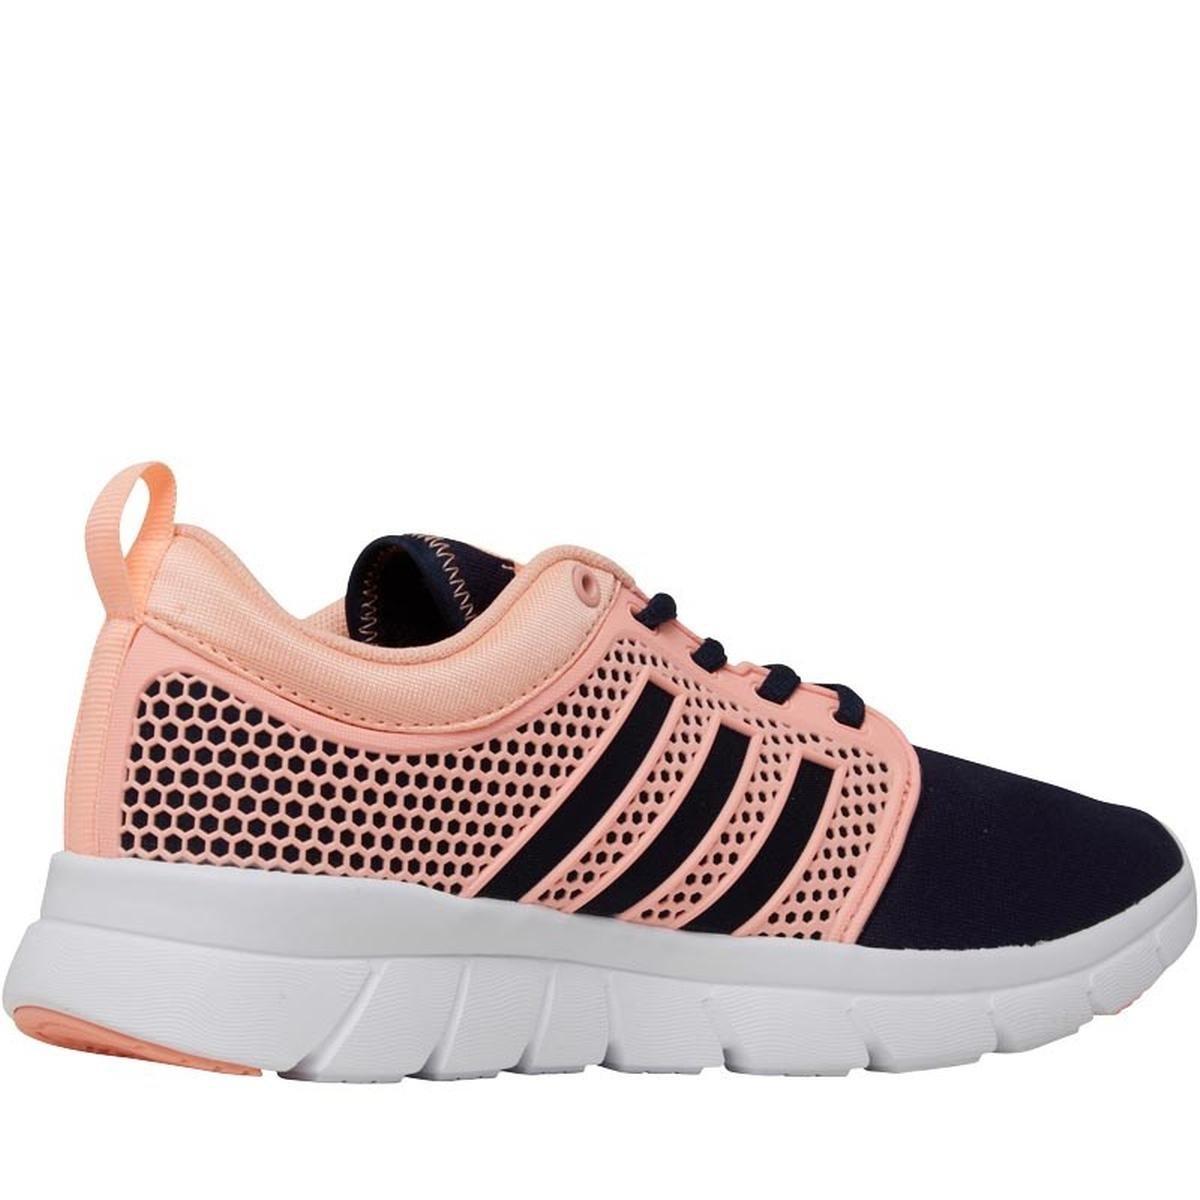 Adidas Neo Ladies Cloudfoam Trainers - Größe UK UK Größe 9 / EU 43.3 - 99dc48